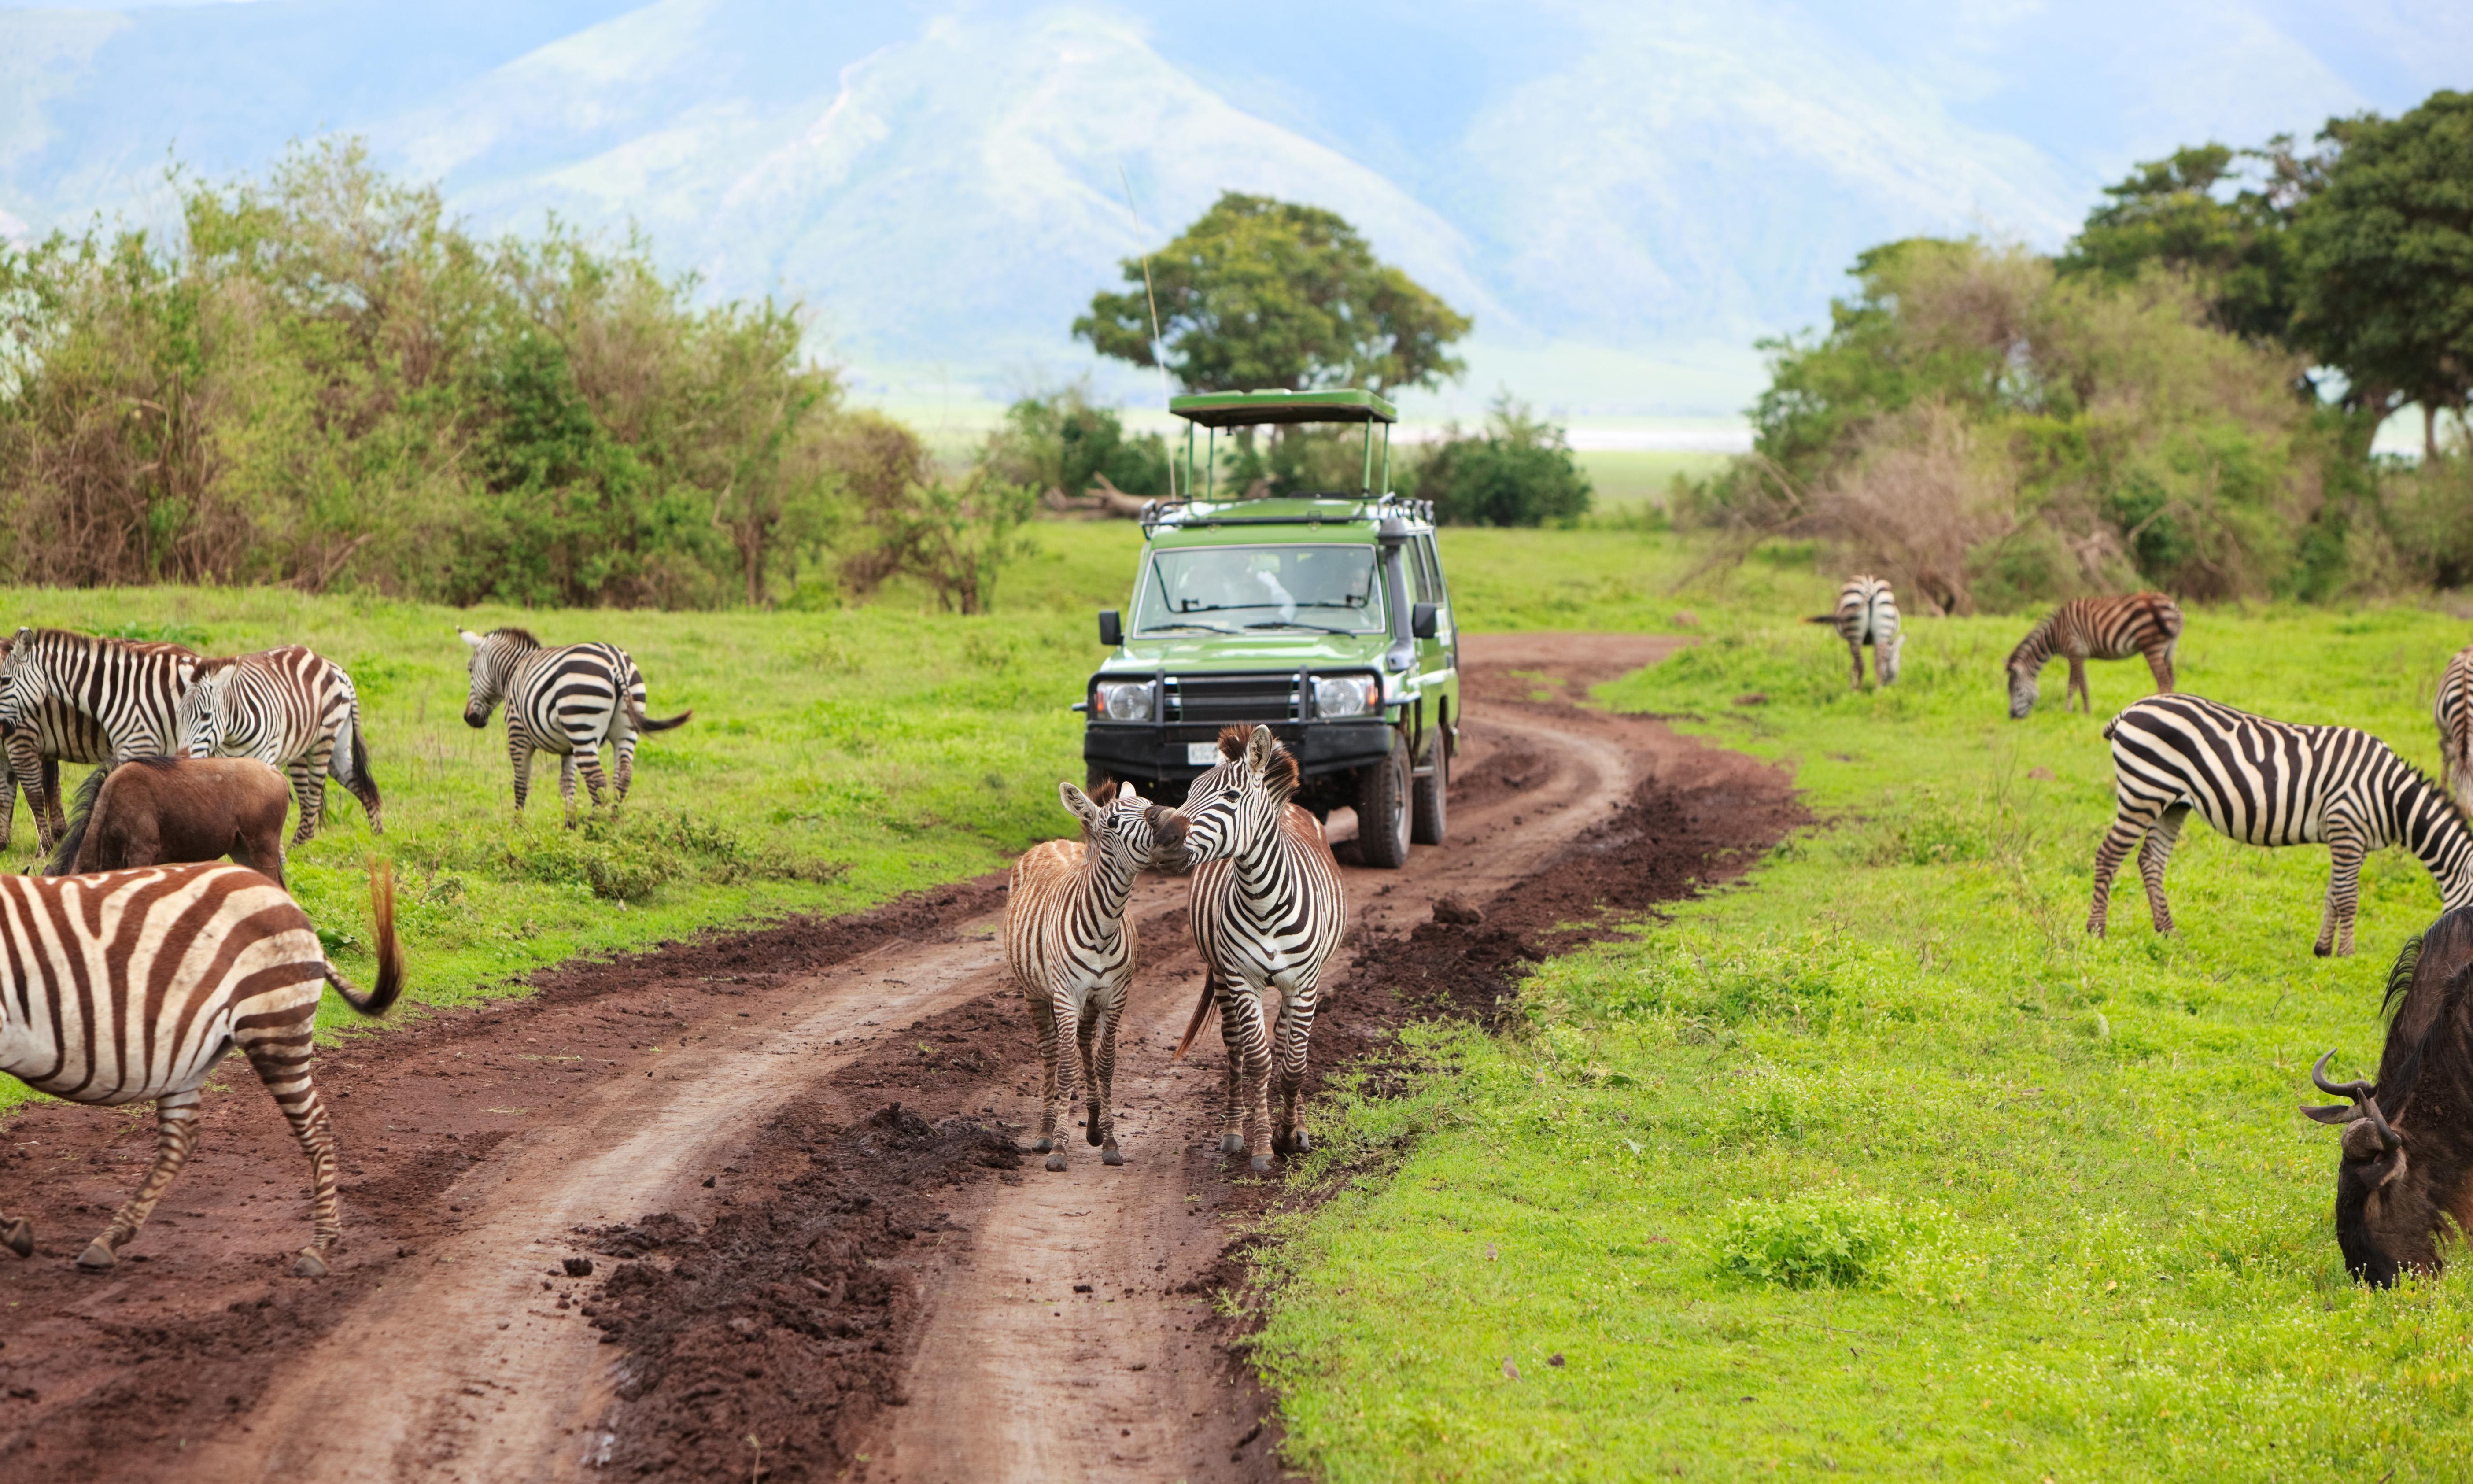 WEI Great Wildebeest Safari